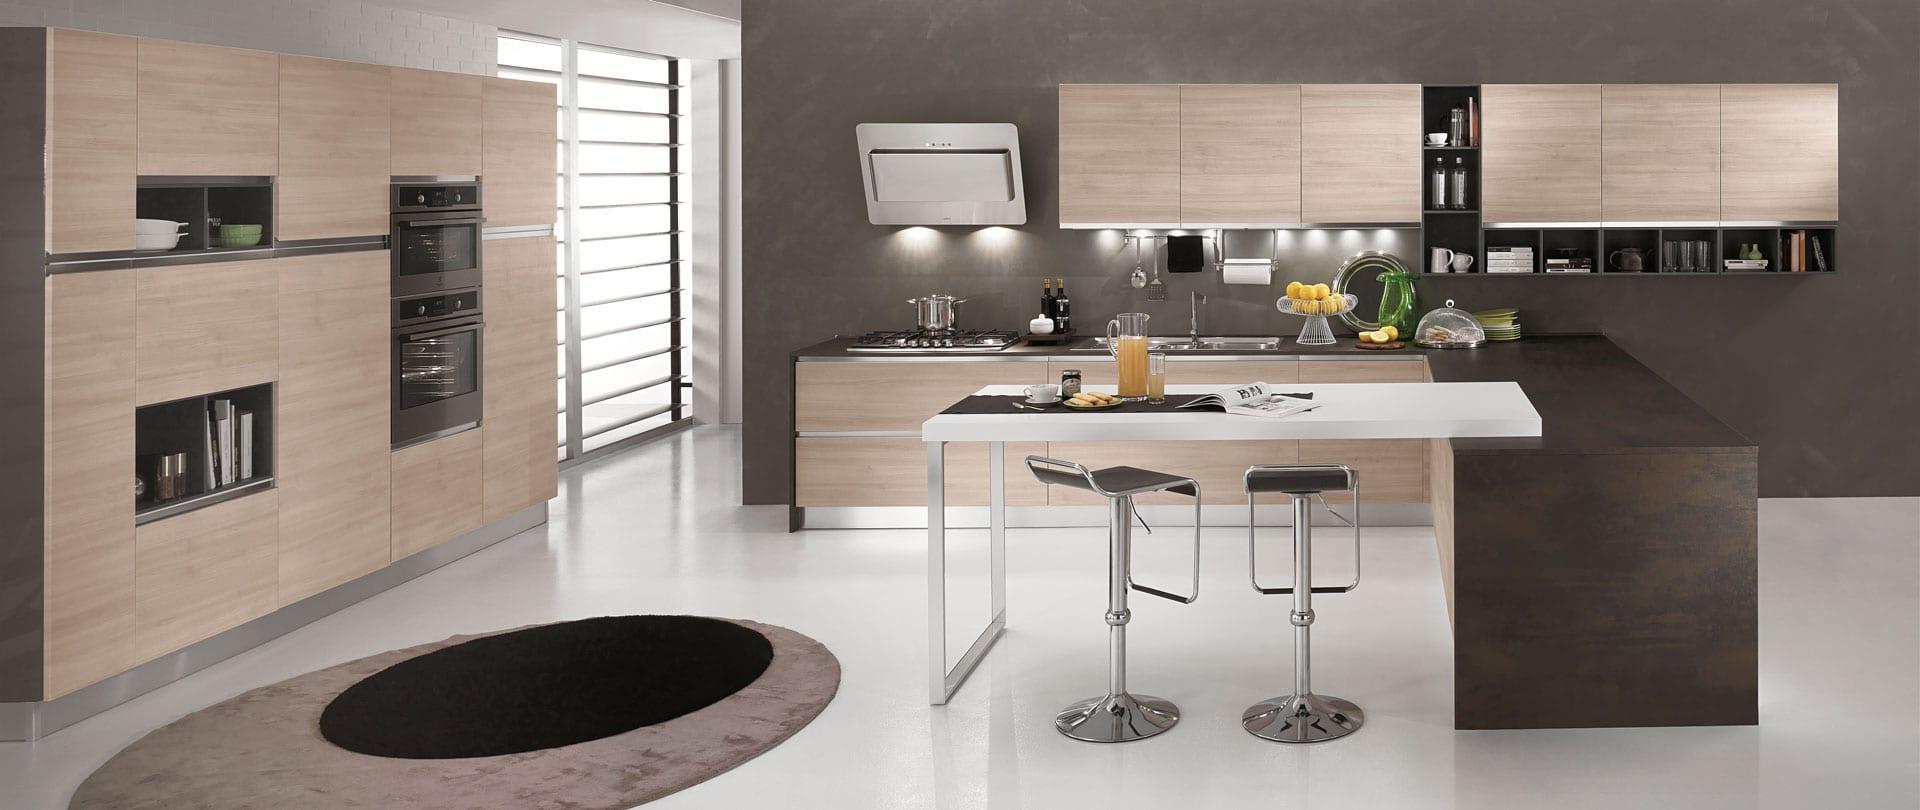 04-cucina-moderna-newmeg-tranche-naturale